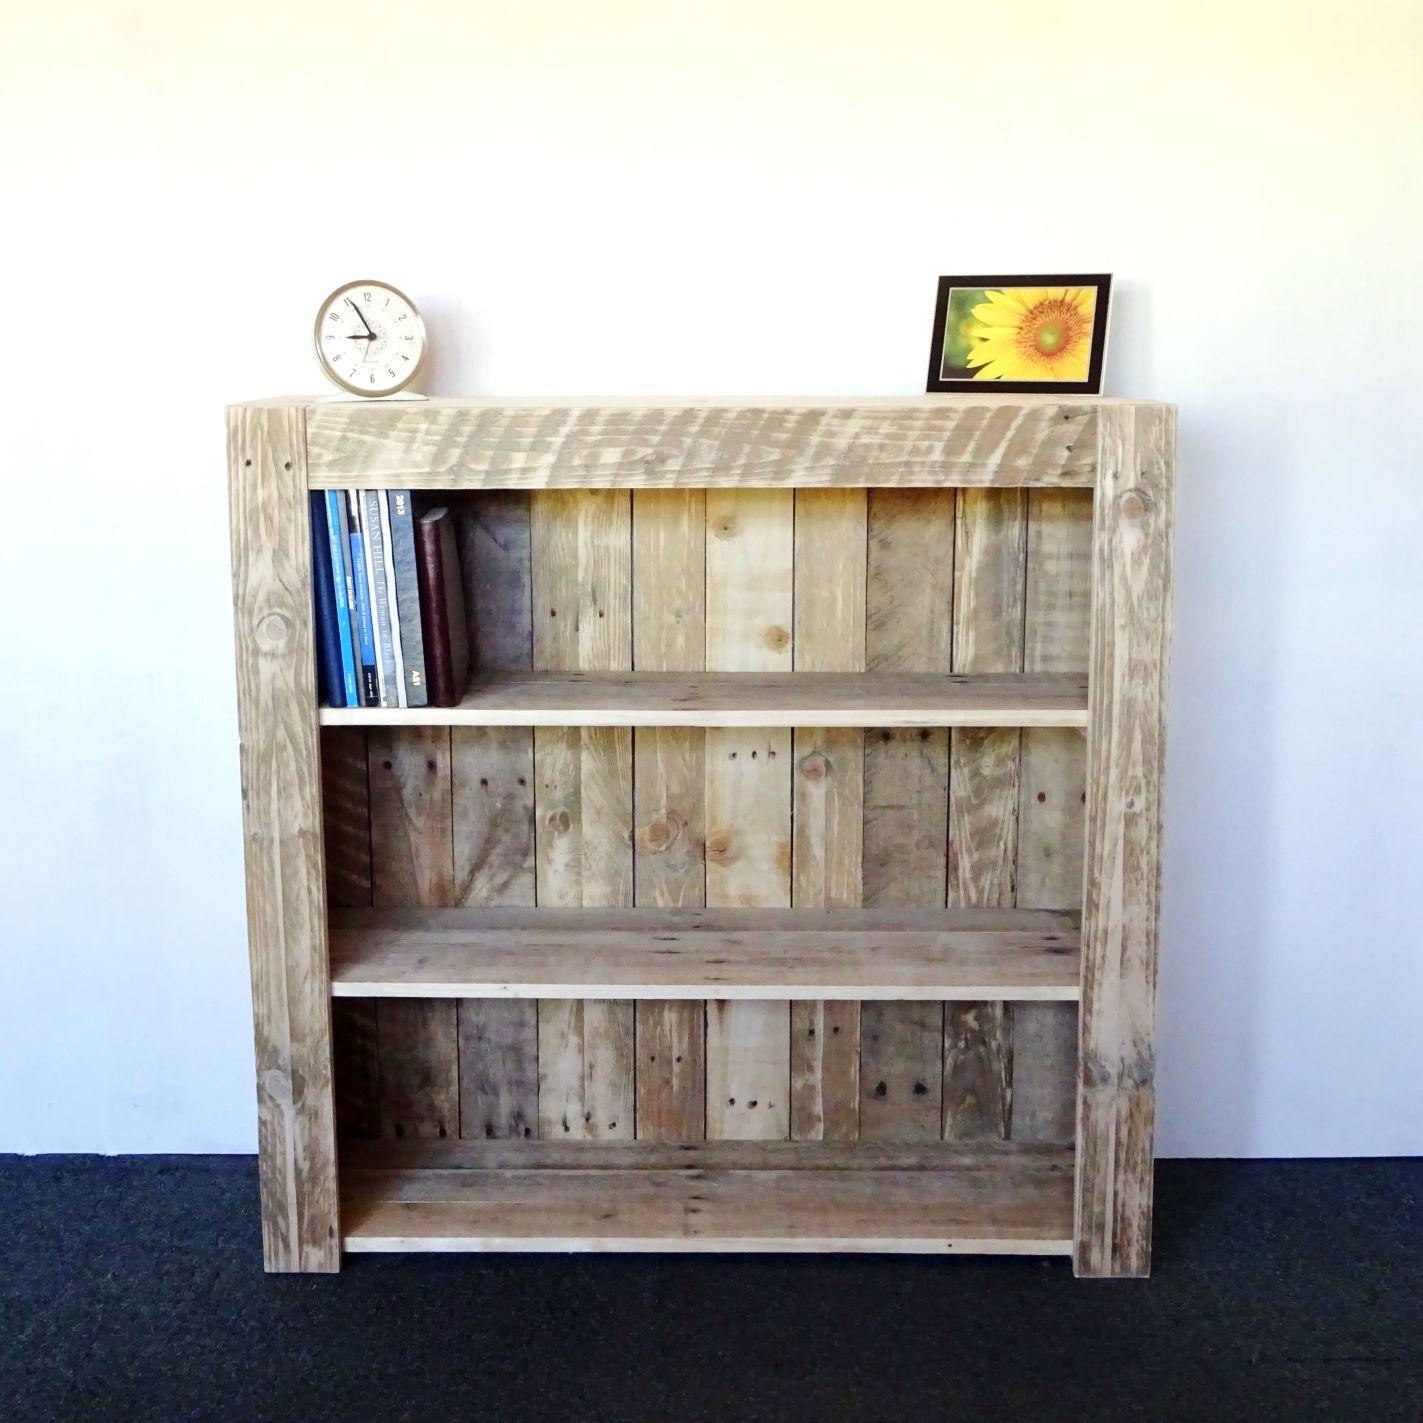 Pallet Bookcase | TRABAJO CON PARIHUELA | Pinterest | Palets ...